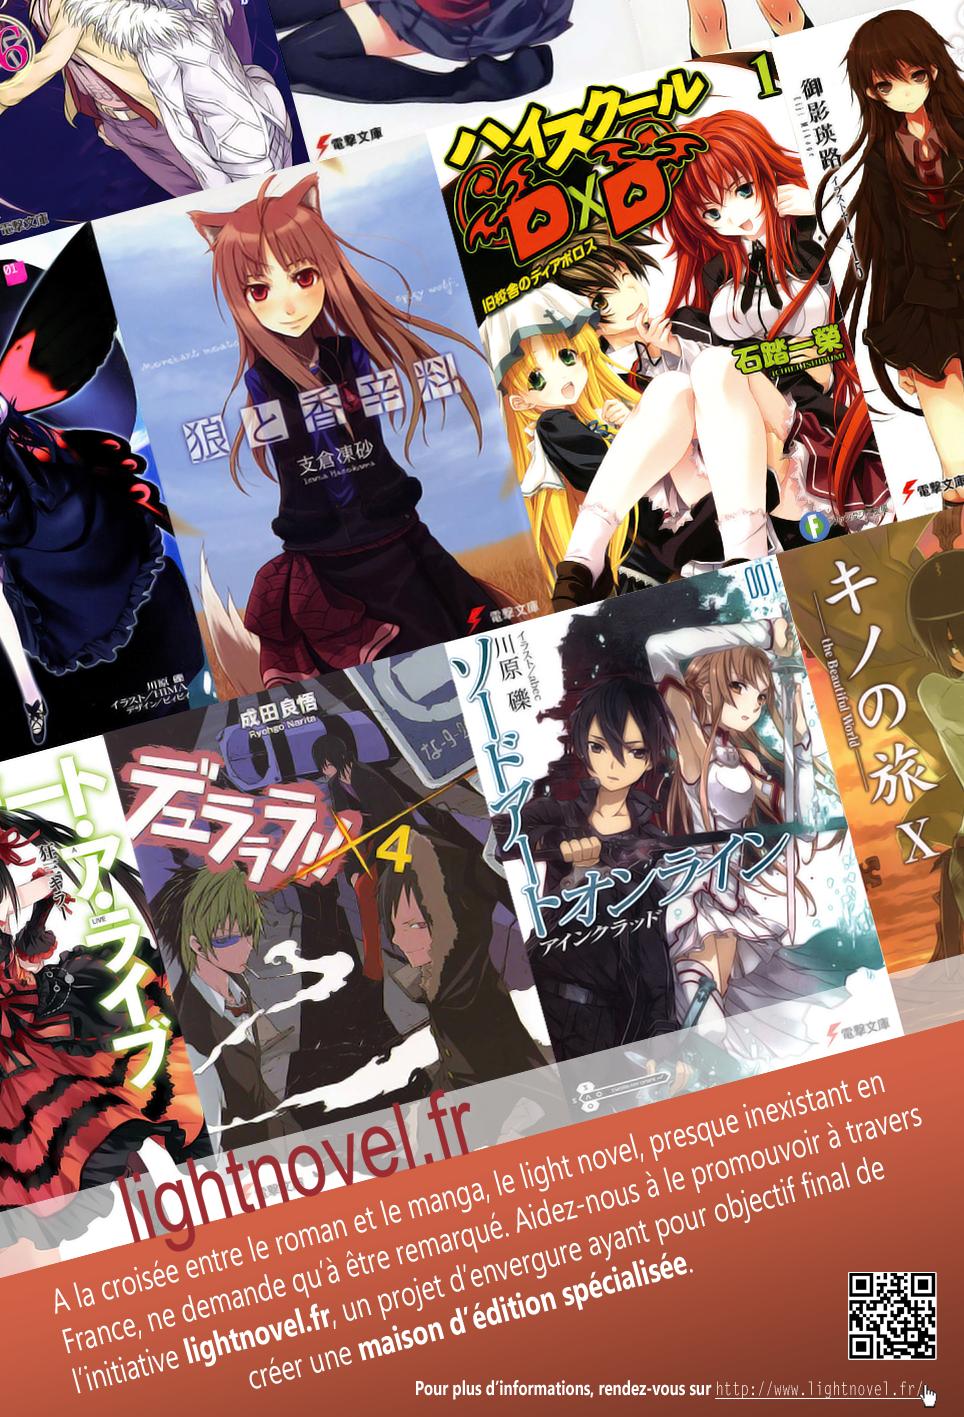 http://www.manga-news.com/public/2014/news_fr_01/affiche-light-novel-fr-janv.png